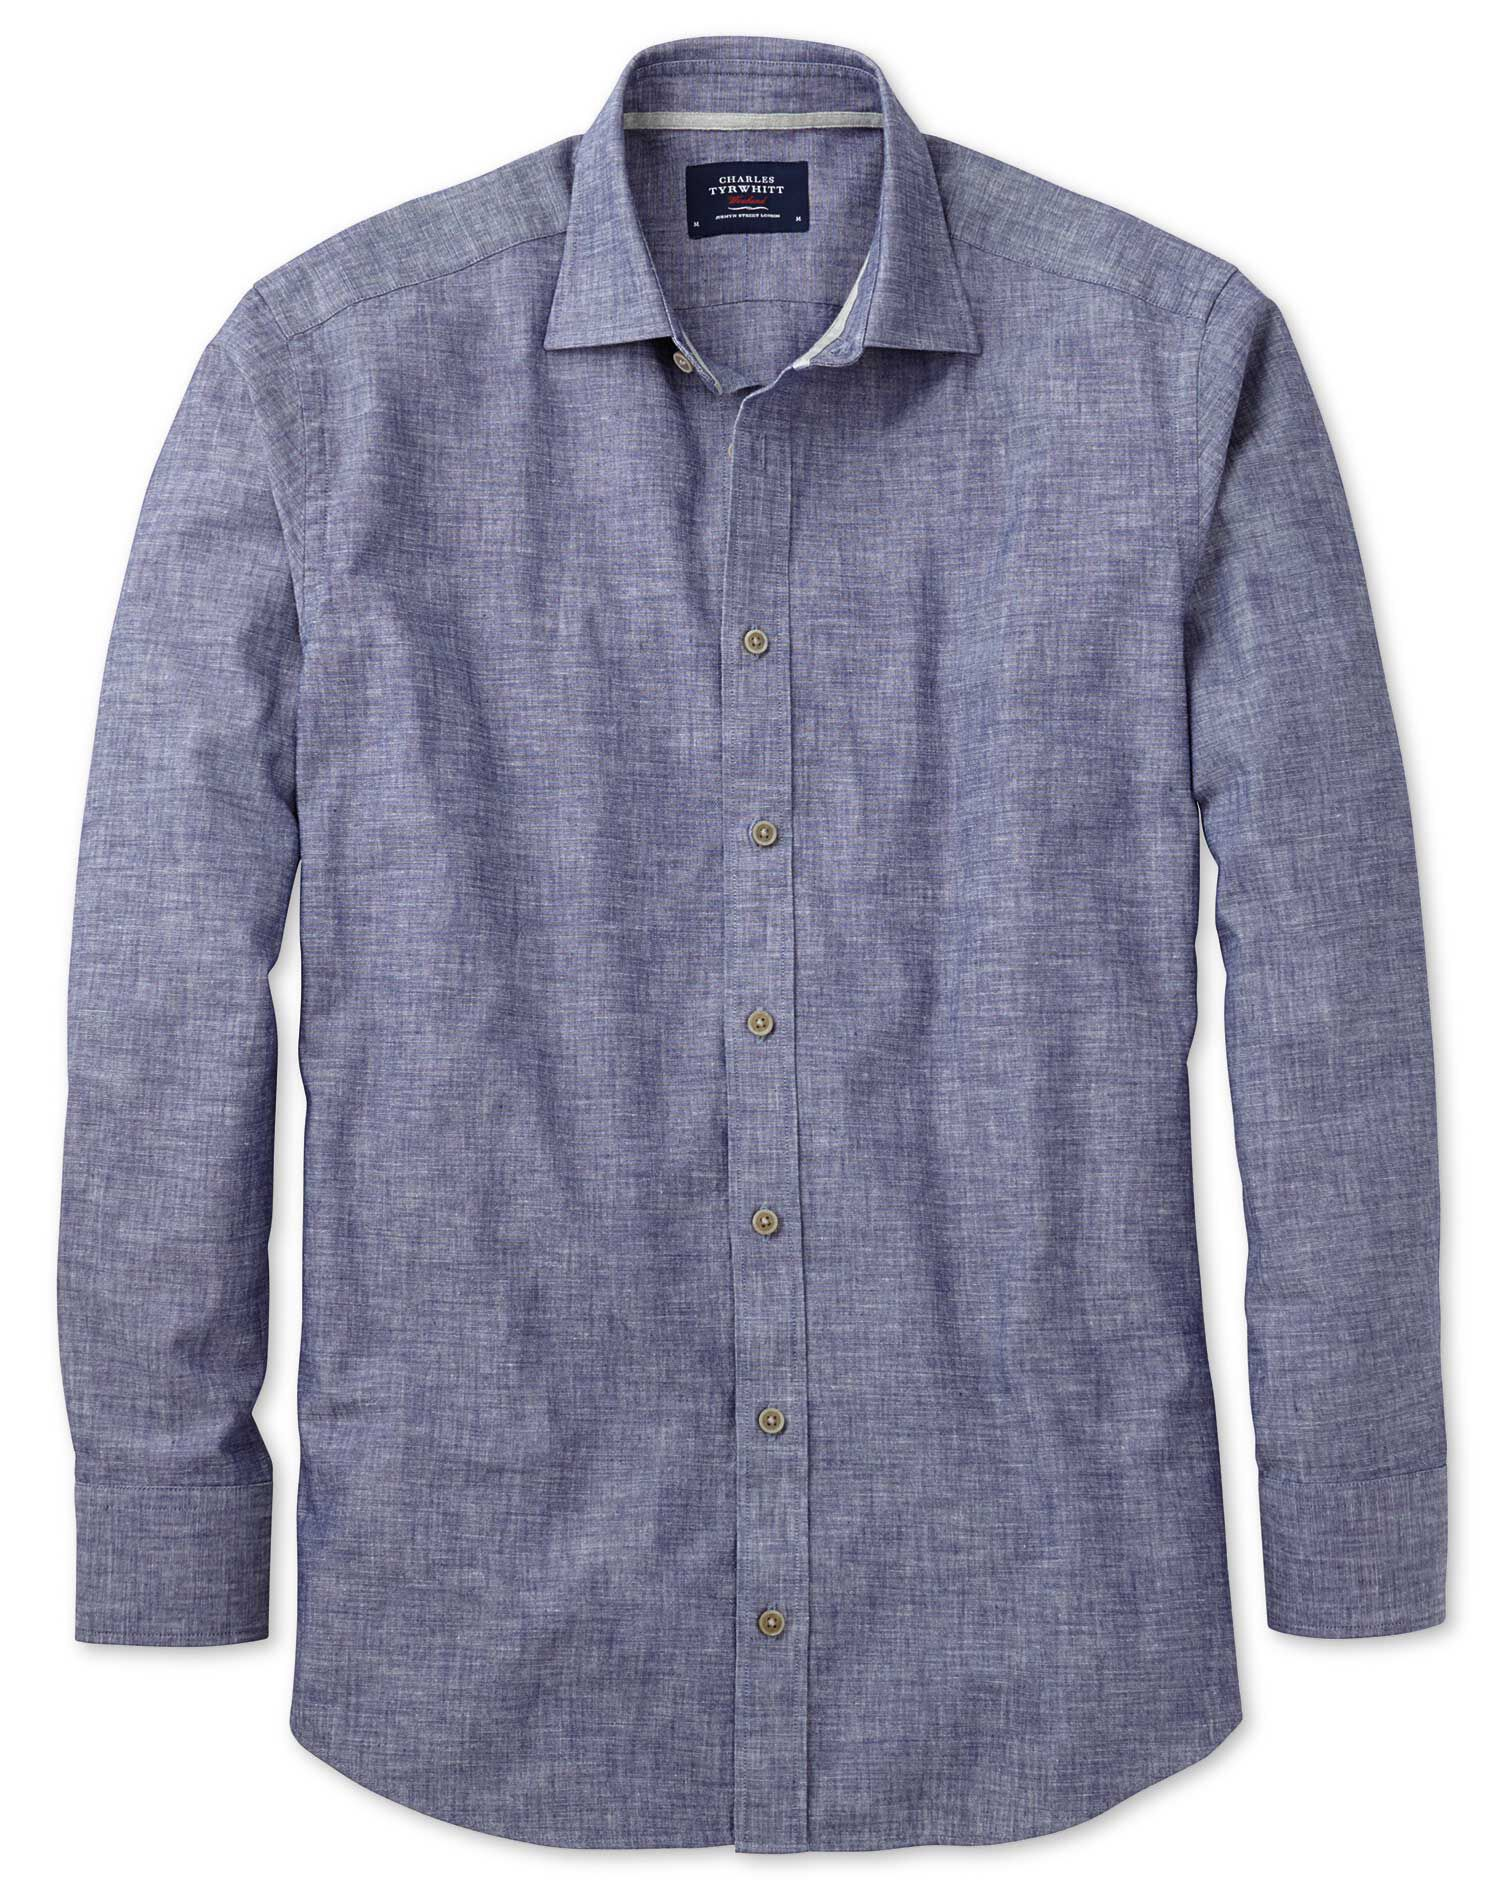 Slim Fit Chambray Navy Textured Cotton Shirt Single Cuff Size XXL by Charles Tyrwhitt